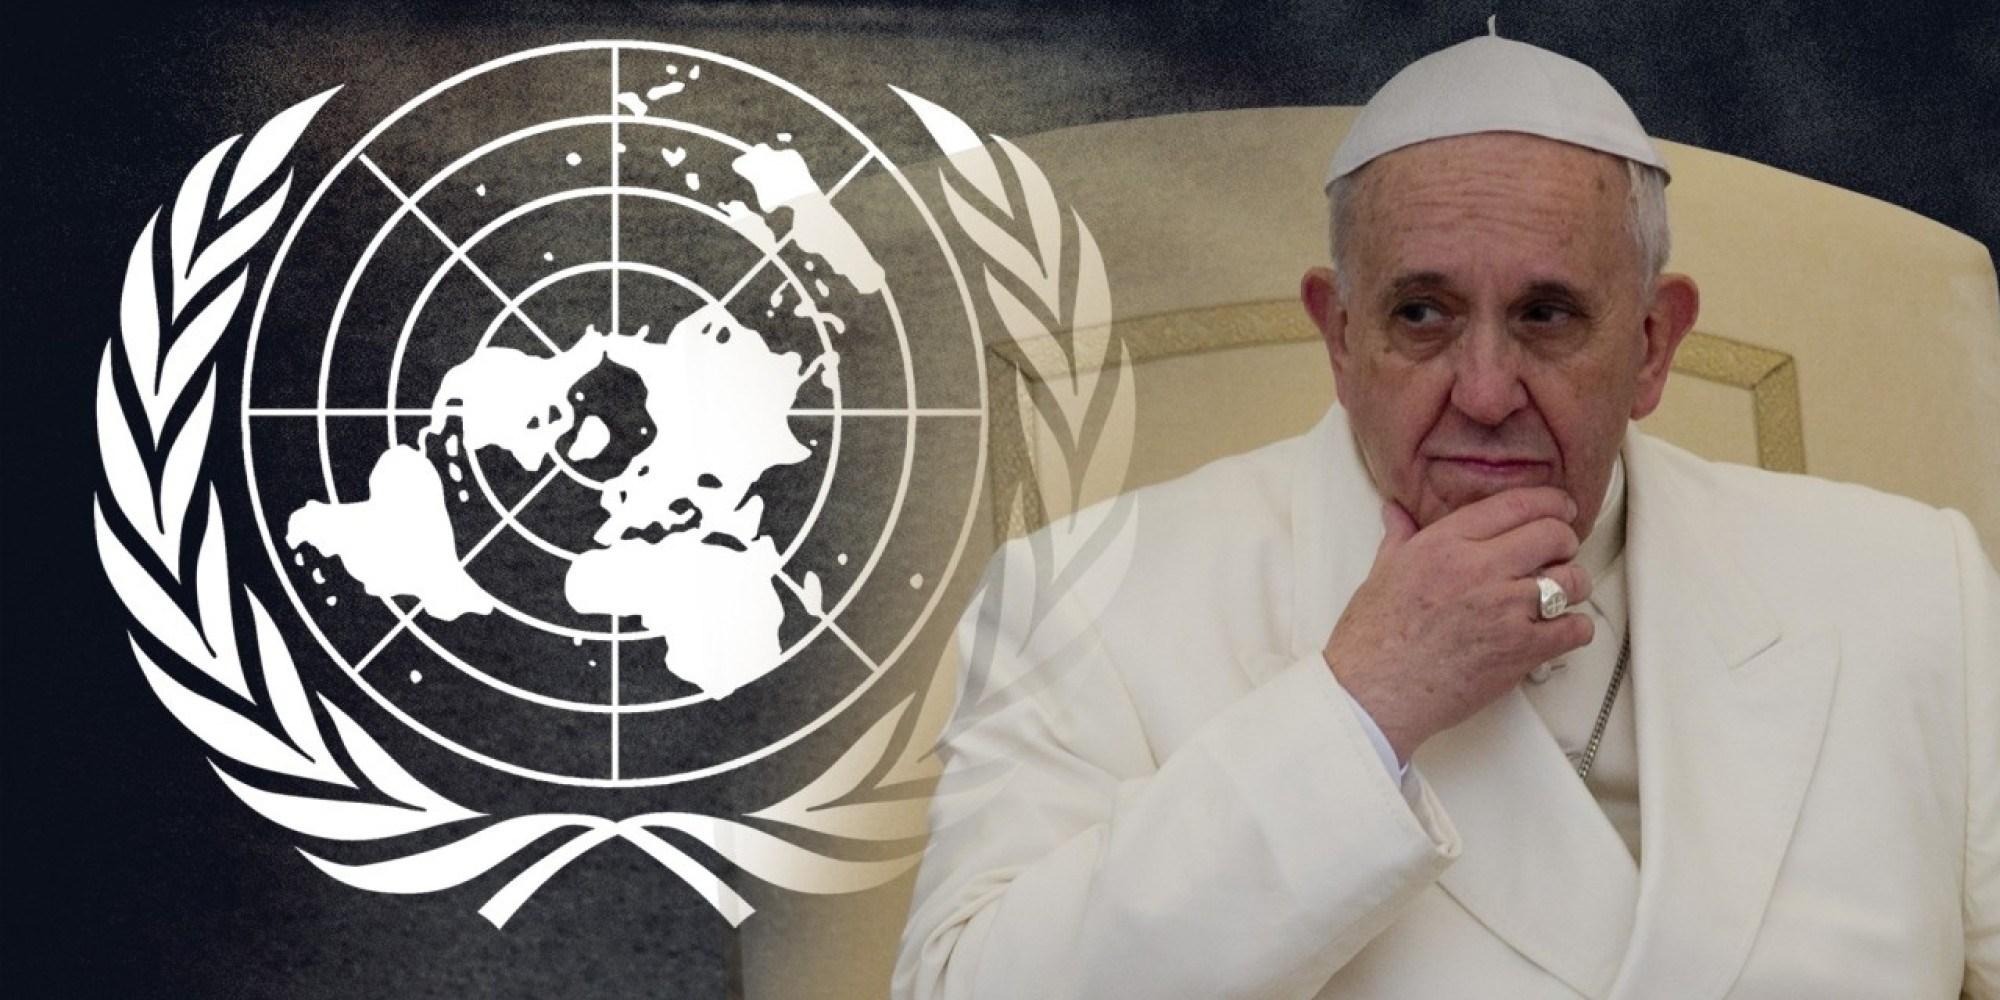 'Mega' Agenda 21 resurrected with pope's help